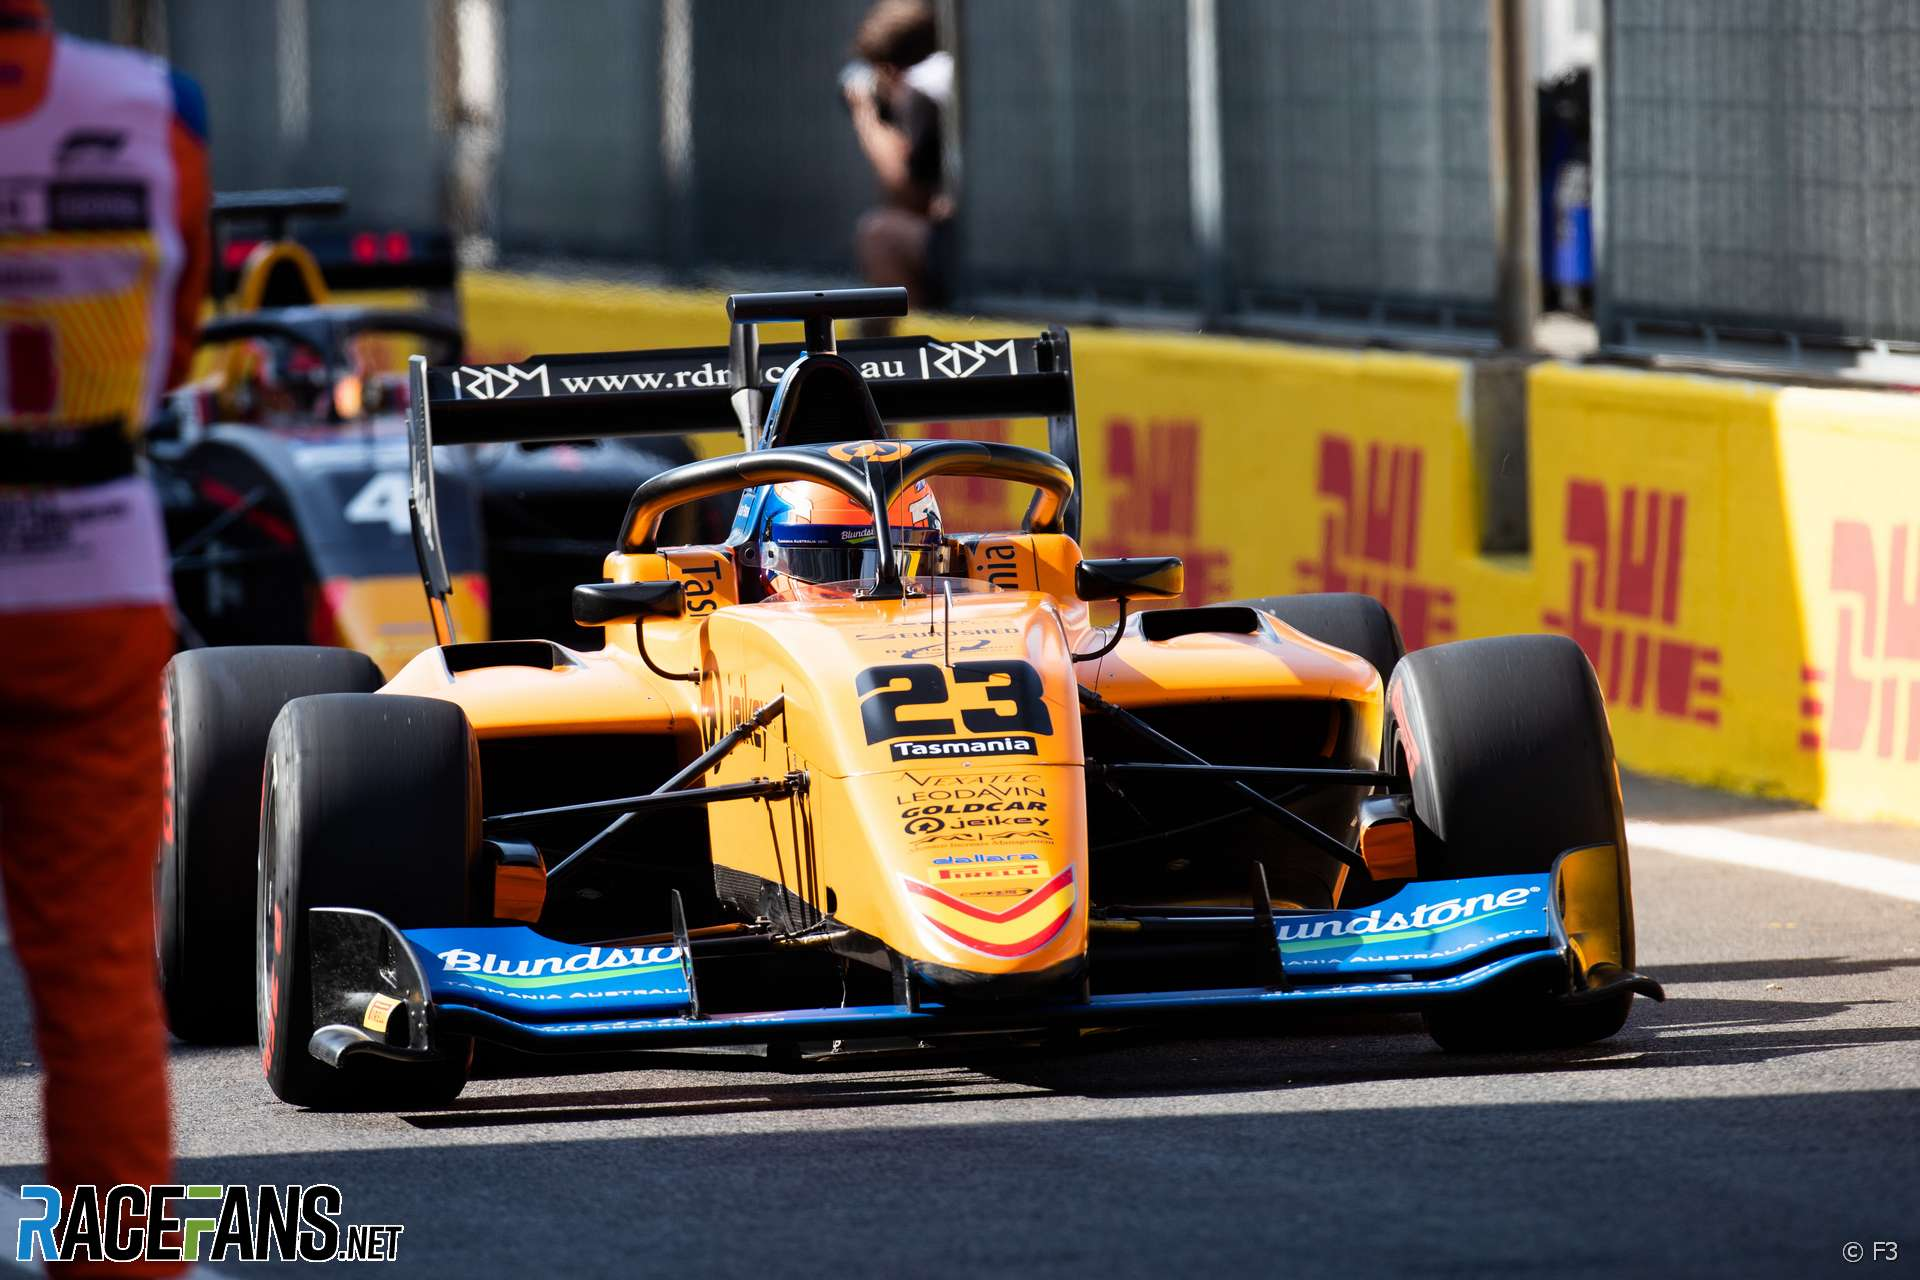 Alex Peroni, Campos, Formula 3, 2019